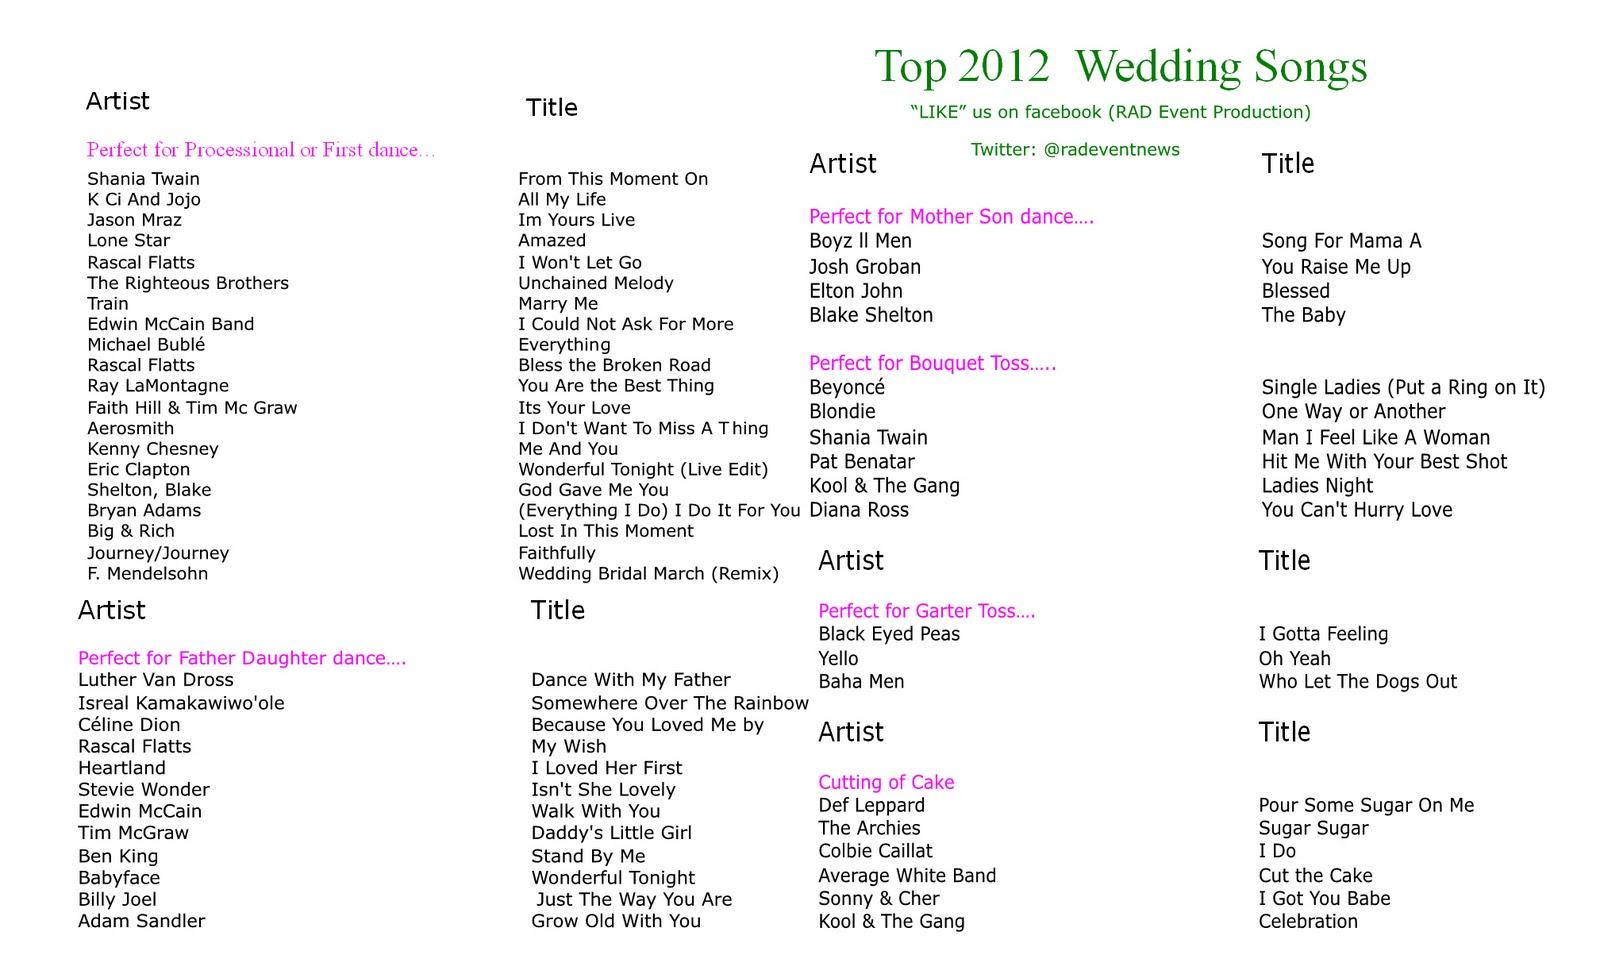 Wedding Songs My Wedding Photos - Best Wedding Cake Songs